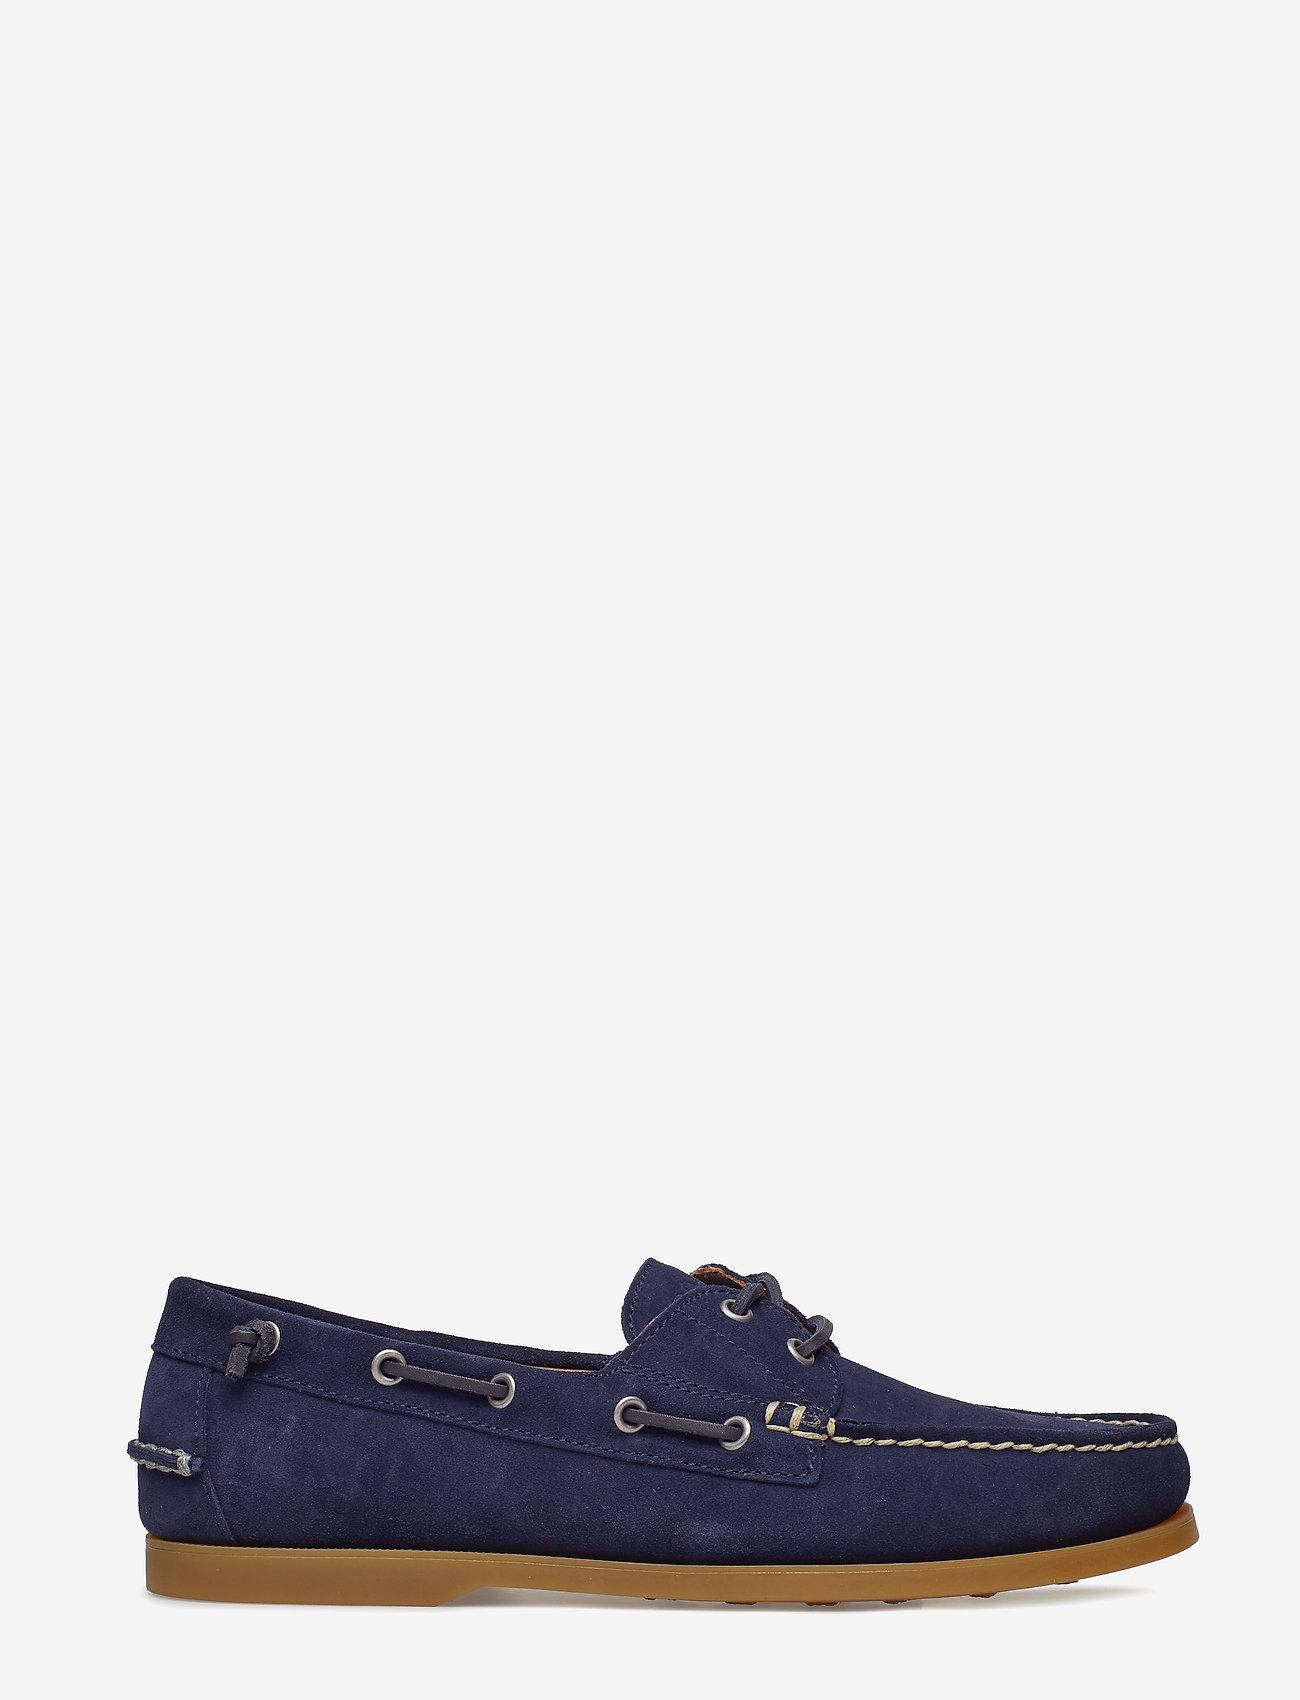 Polo Ralph Lauren Merton Suede Boat Shoe - Shoes